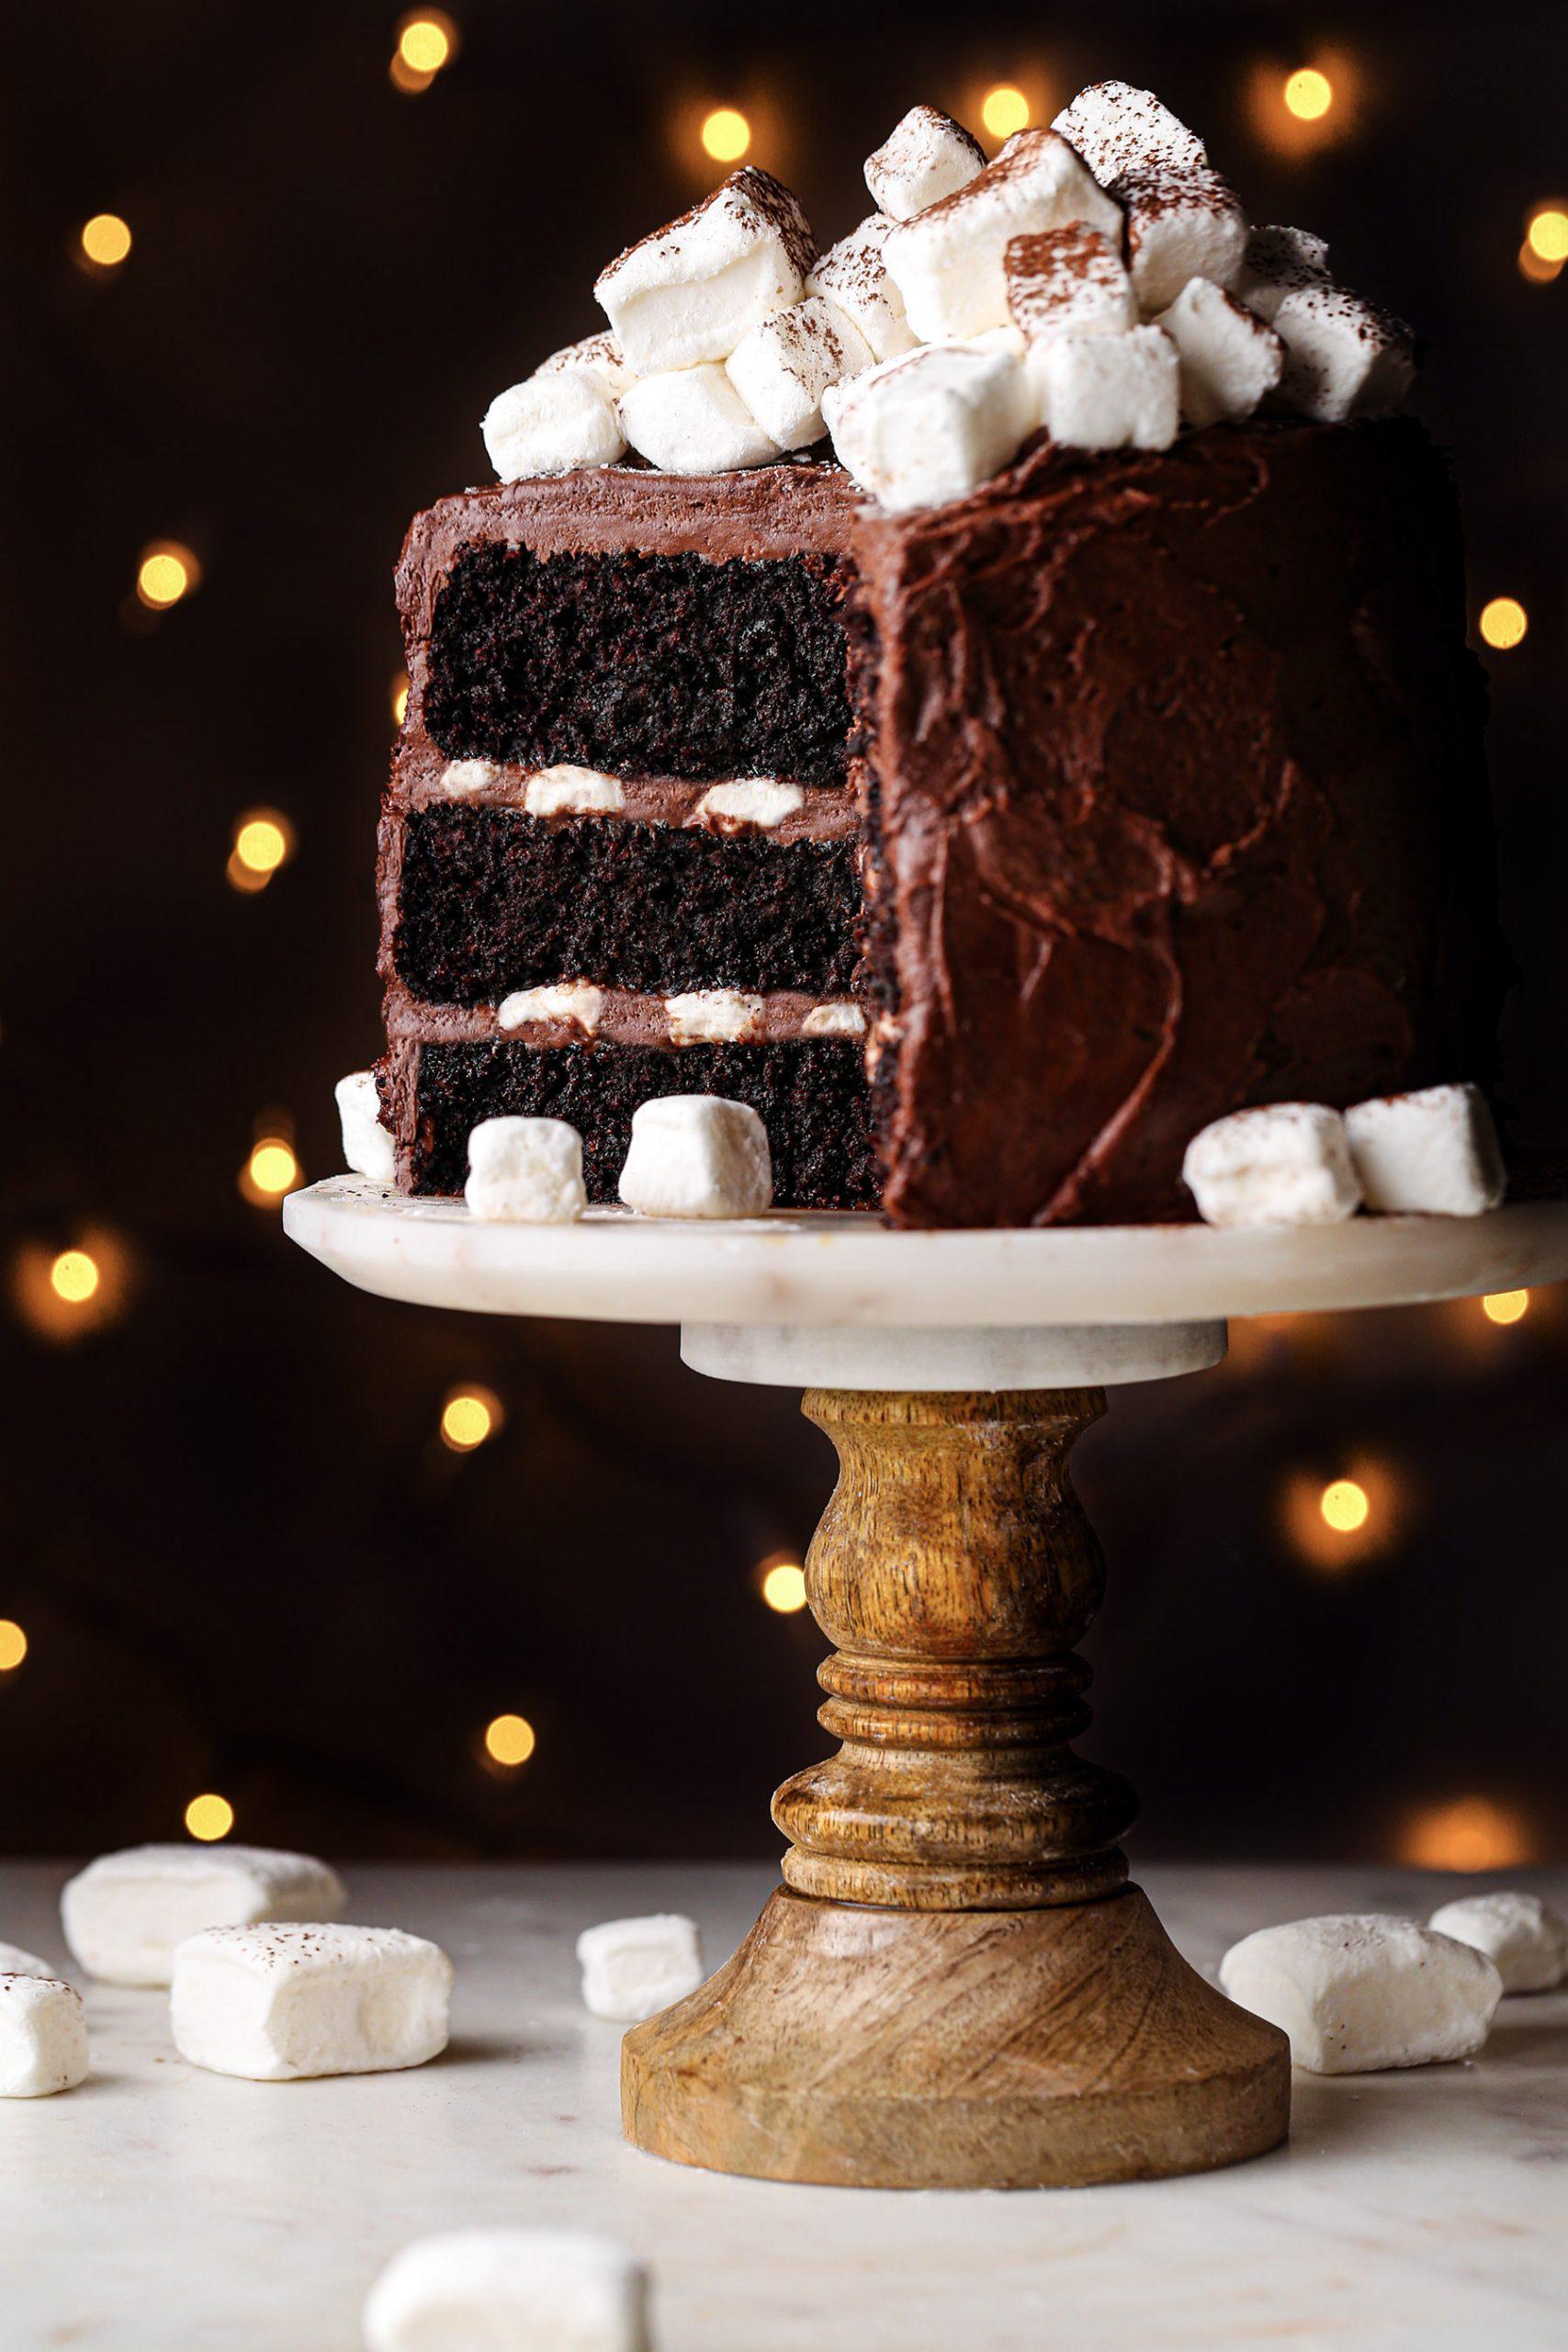 Hot Chocolate Cake   Gluten free, refined sugar free, and vegan options.